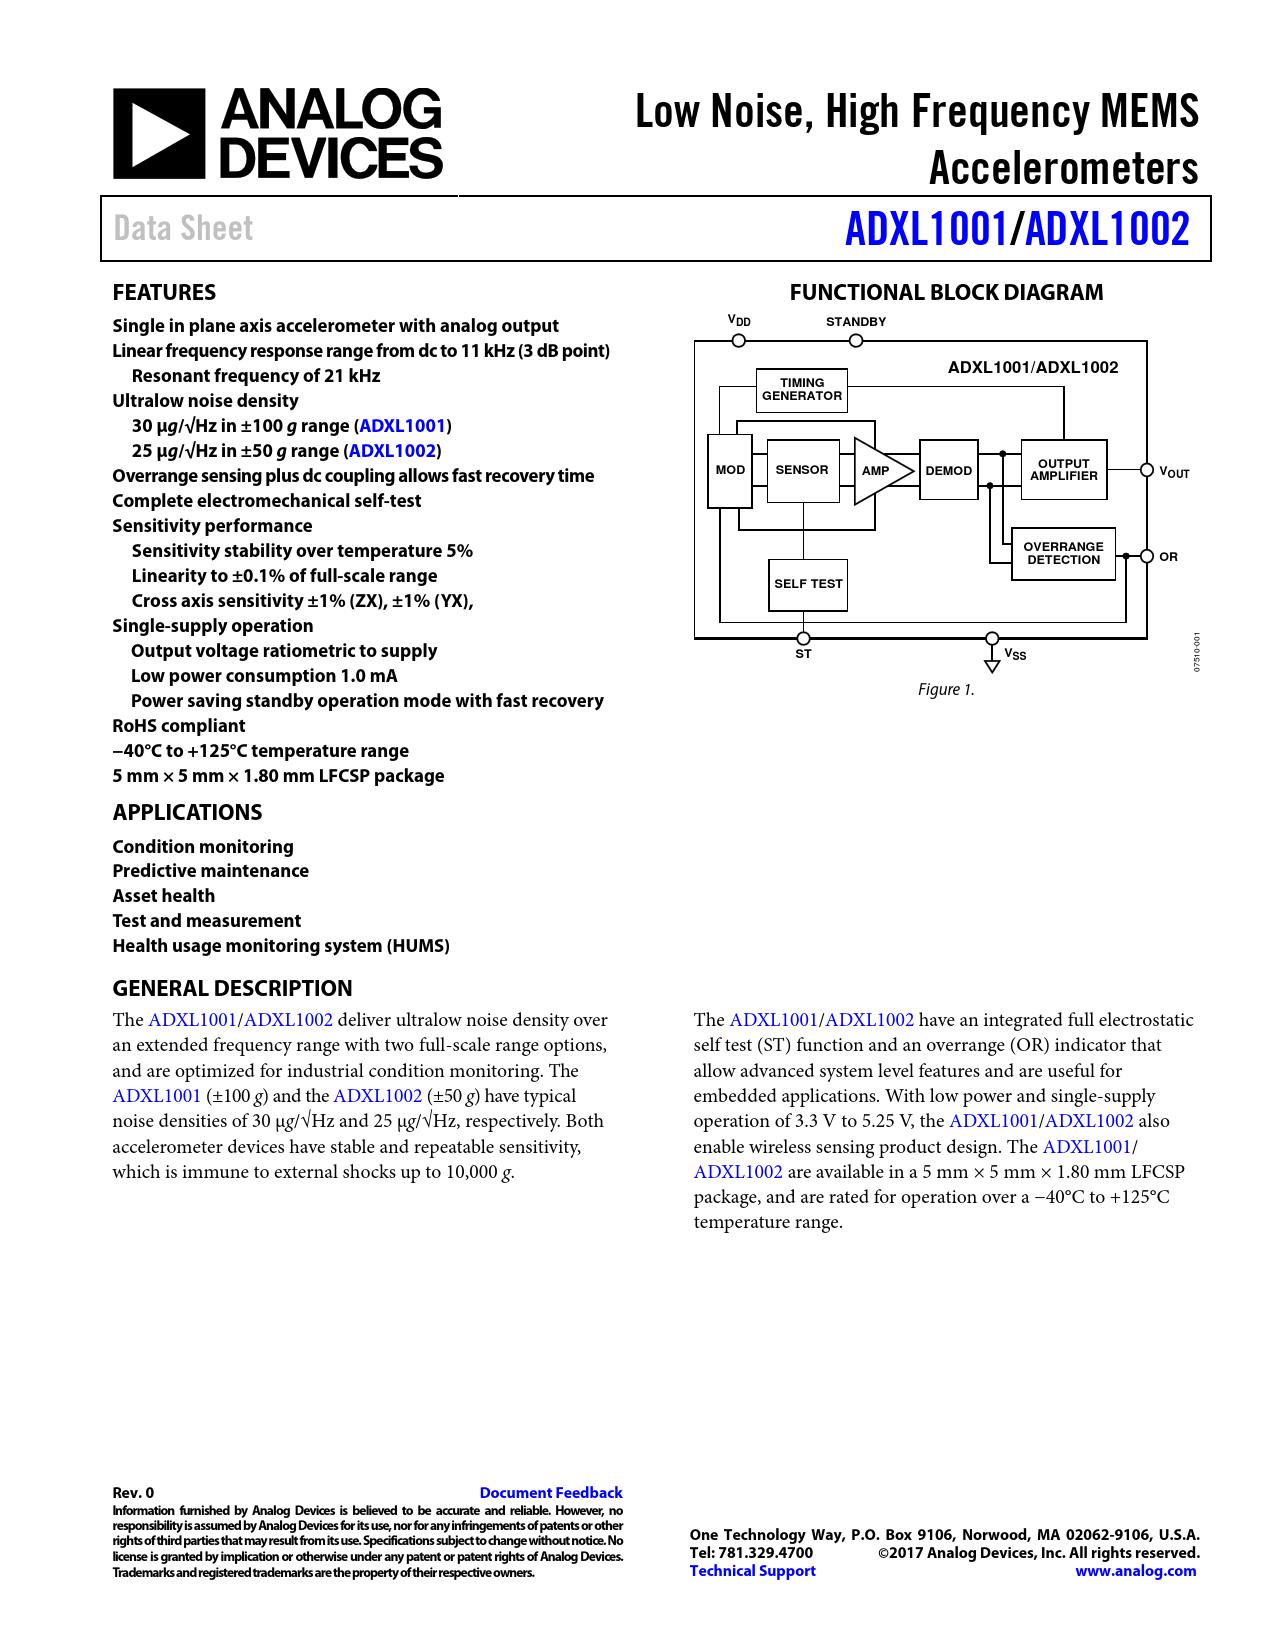 Datasheet ADXL1001, ADXL1002 Analog Devices